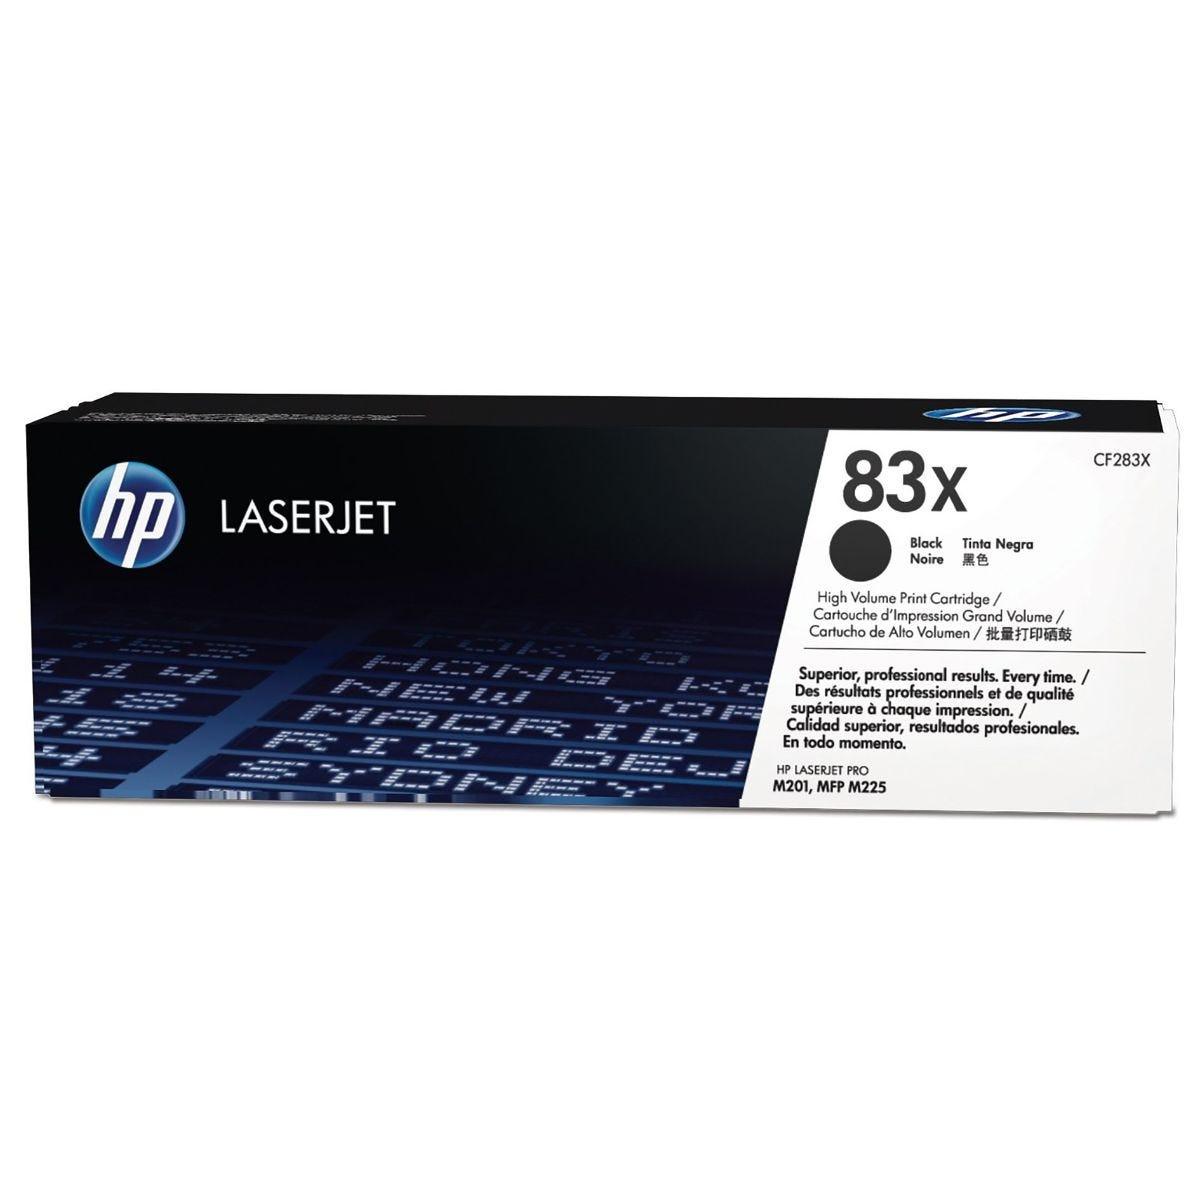 Image of HP 83X High Yield Black Original LaserJet Toner Cartridge CF283X, Black